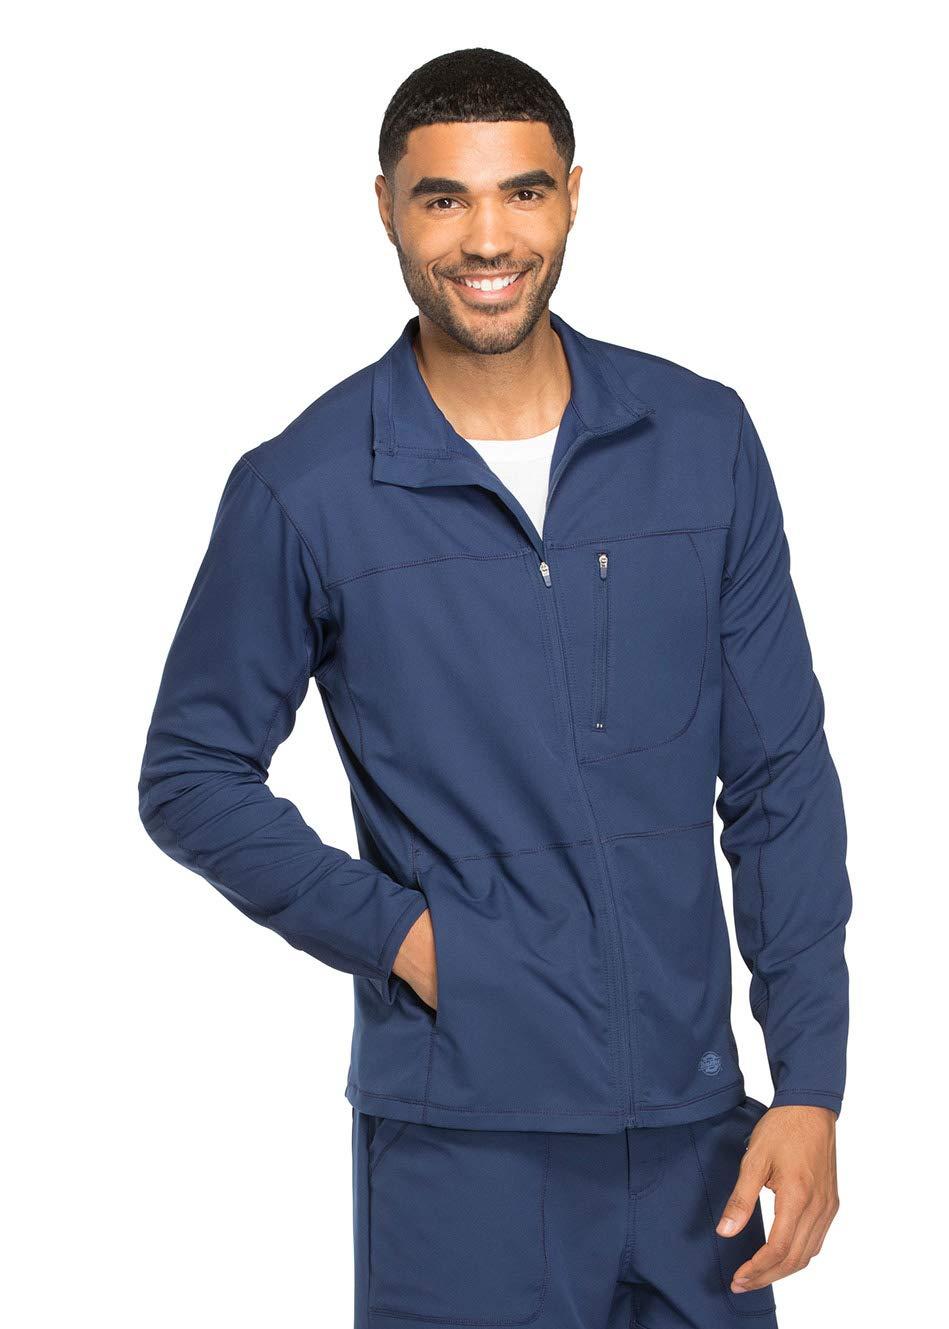 Men's Dynamix Zip Front Warm-Up Jacket by Dickies